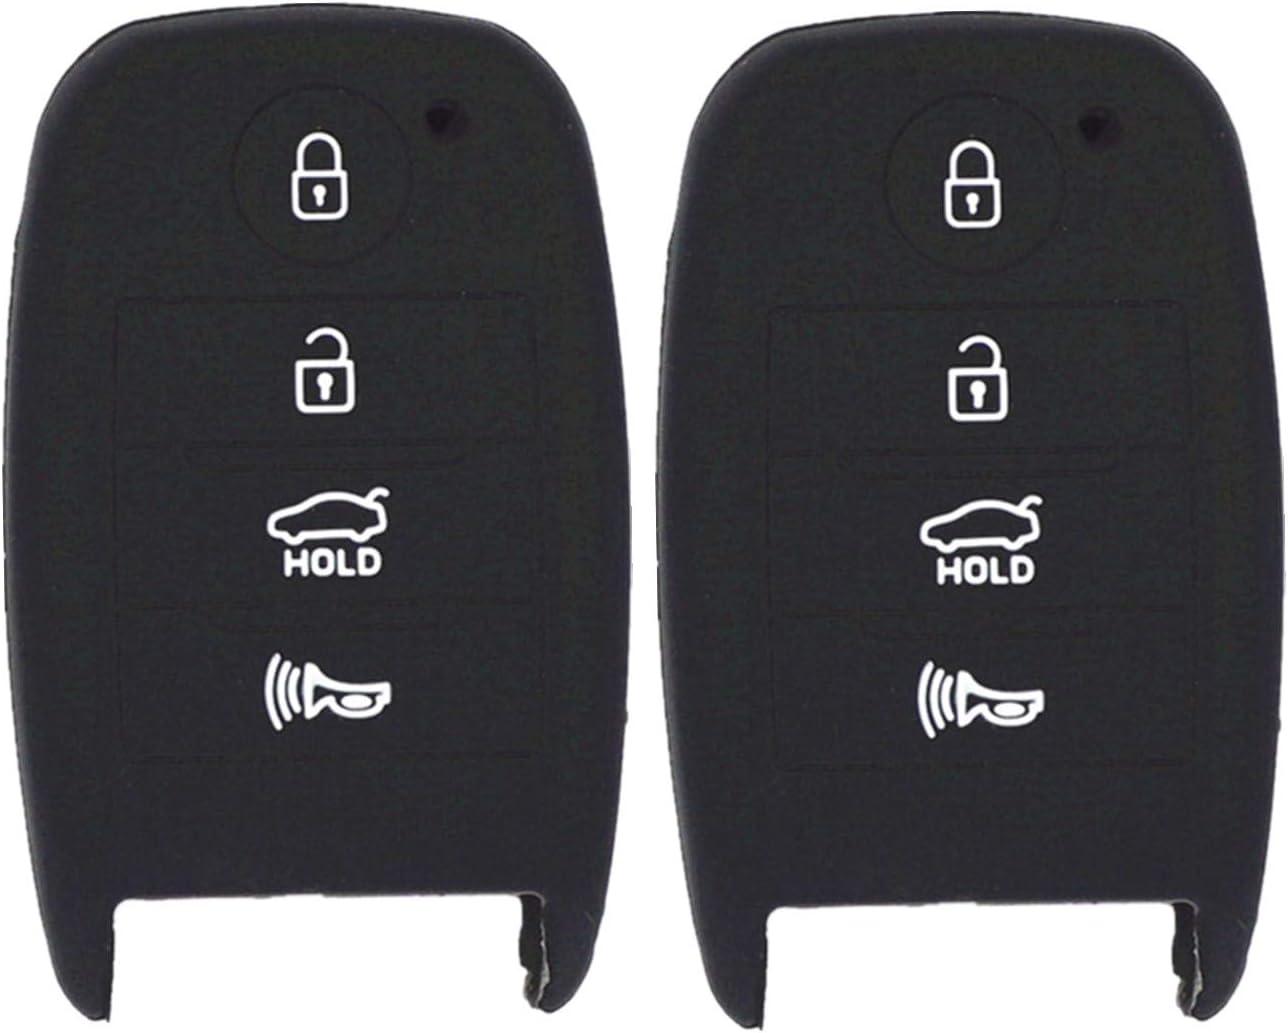 WFMJ 2Pcs Black Silicone for Hyundai Elantra Sonata Tucson i40 ix35 Smart Remote 4 Buttons Key Chain Cover Case